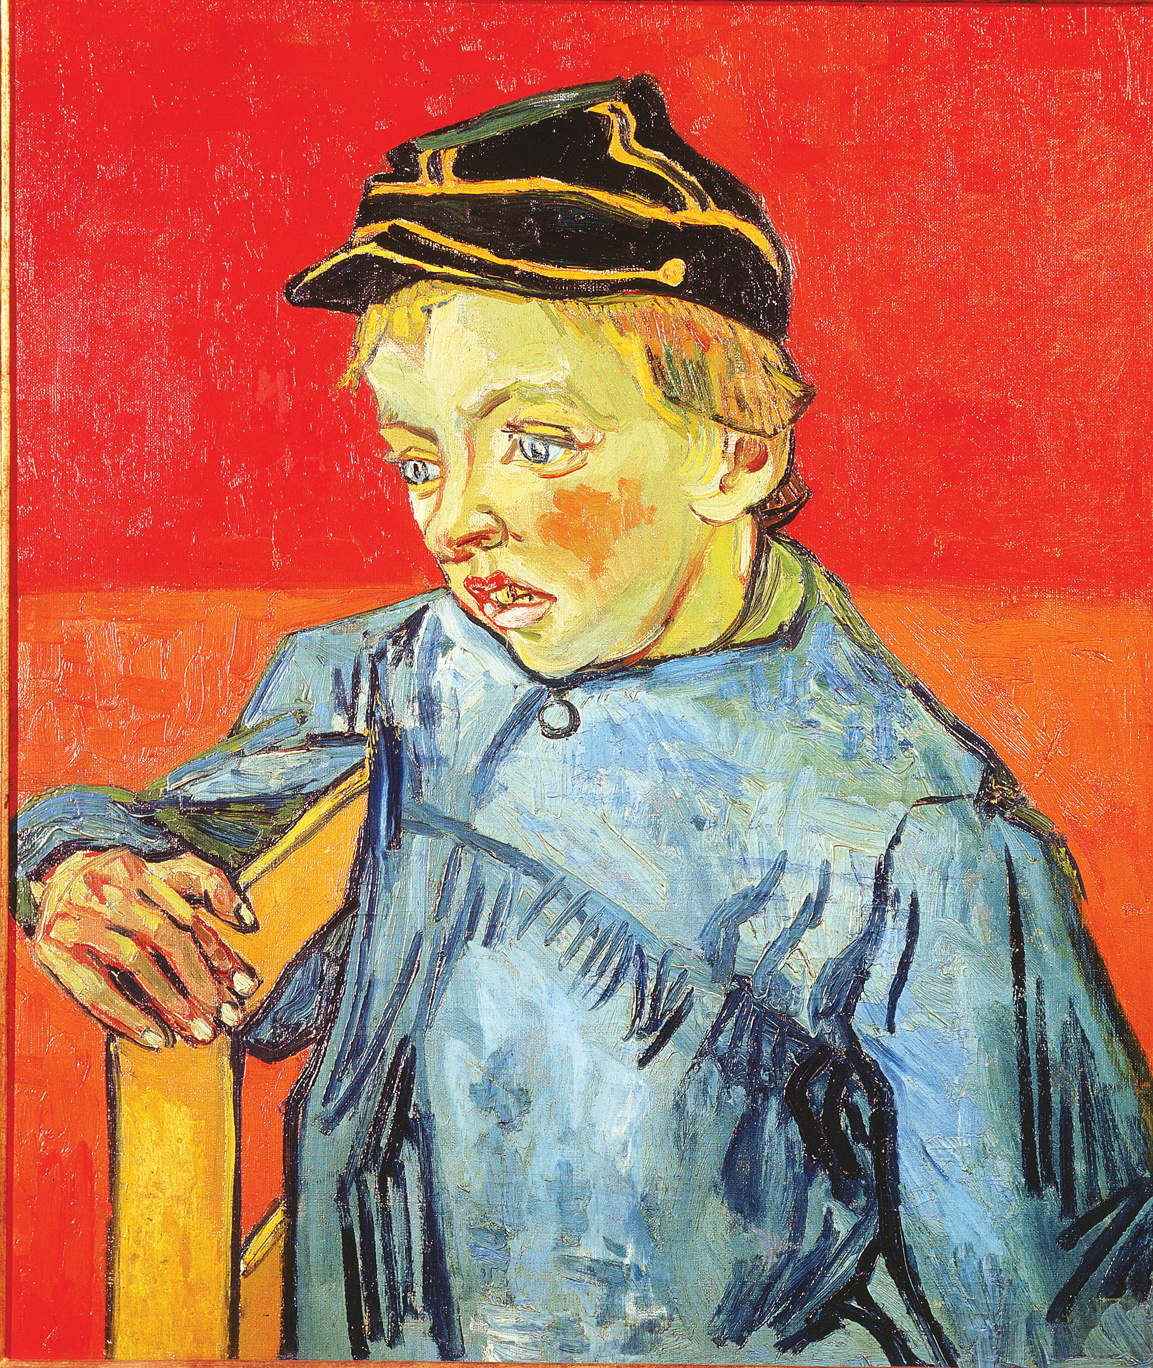 The Schoolboy (Camille Roulin), by Vincent van Gogh, 1888. São Paulo Museum of Art, São Paulo, Brazil.